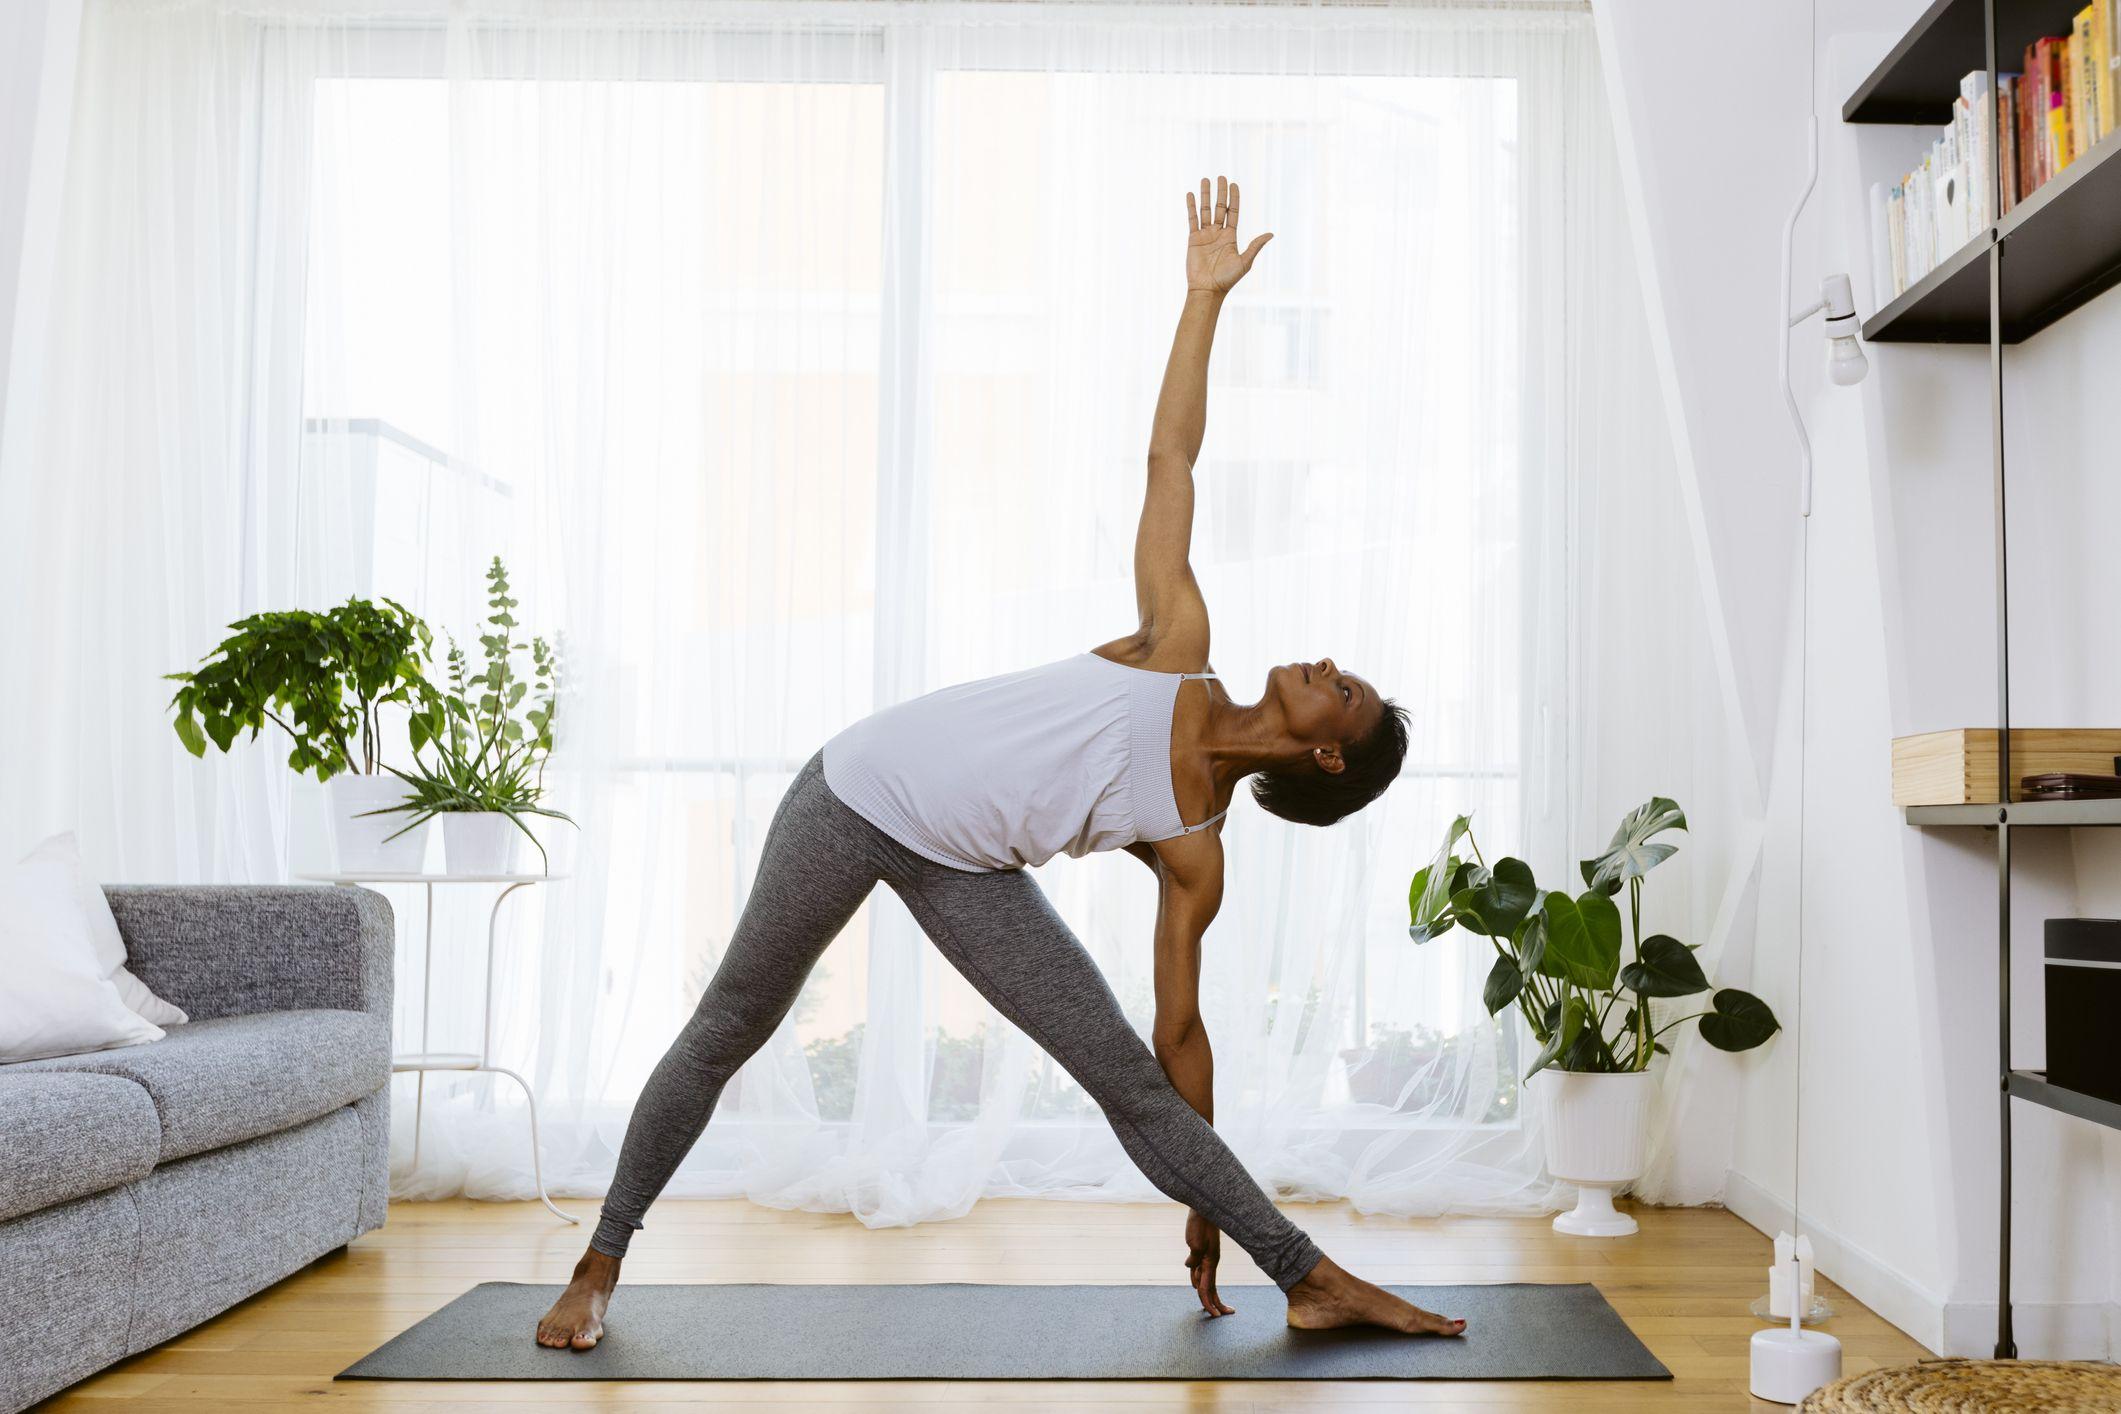 35 Yoga Youtube Videos Worth Doing Beginner To Advanced